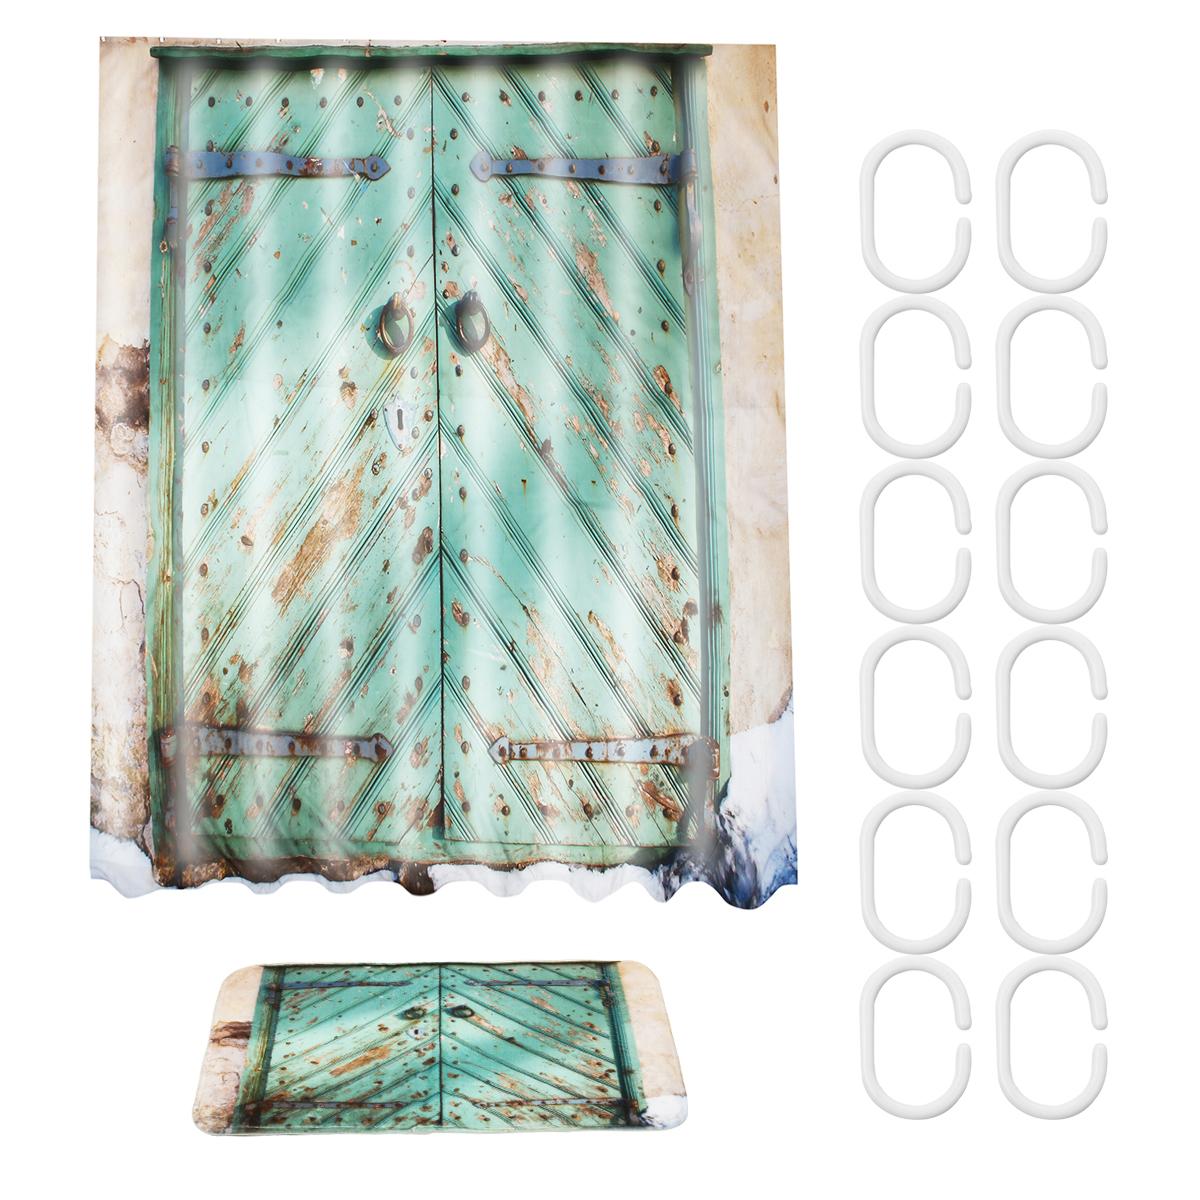 180cm X 180cm Rustic Wooden Barn Door Bathroom Waterproof Fabric Shower Curtain Flannel Bathroom Mat